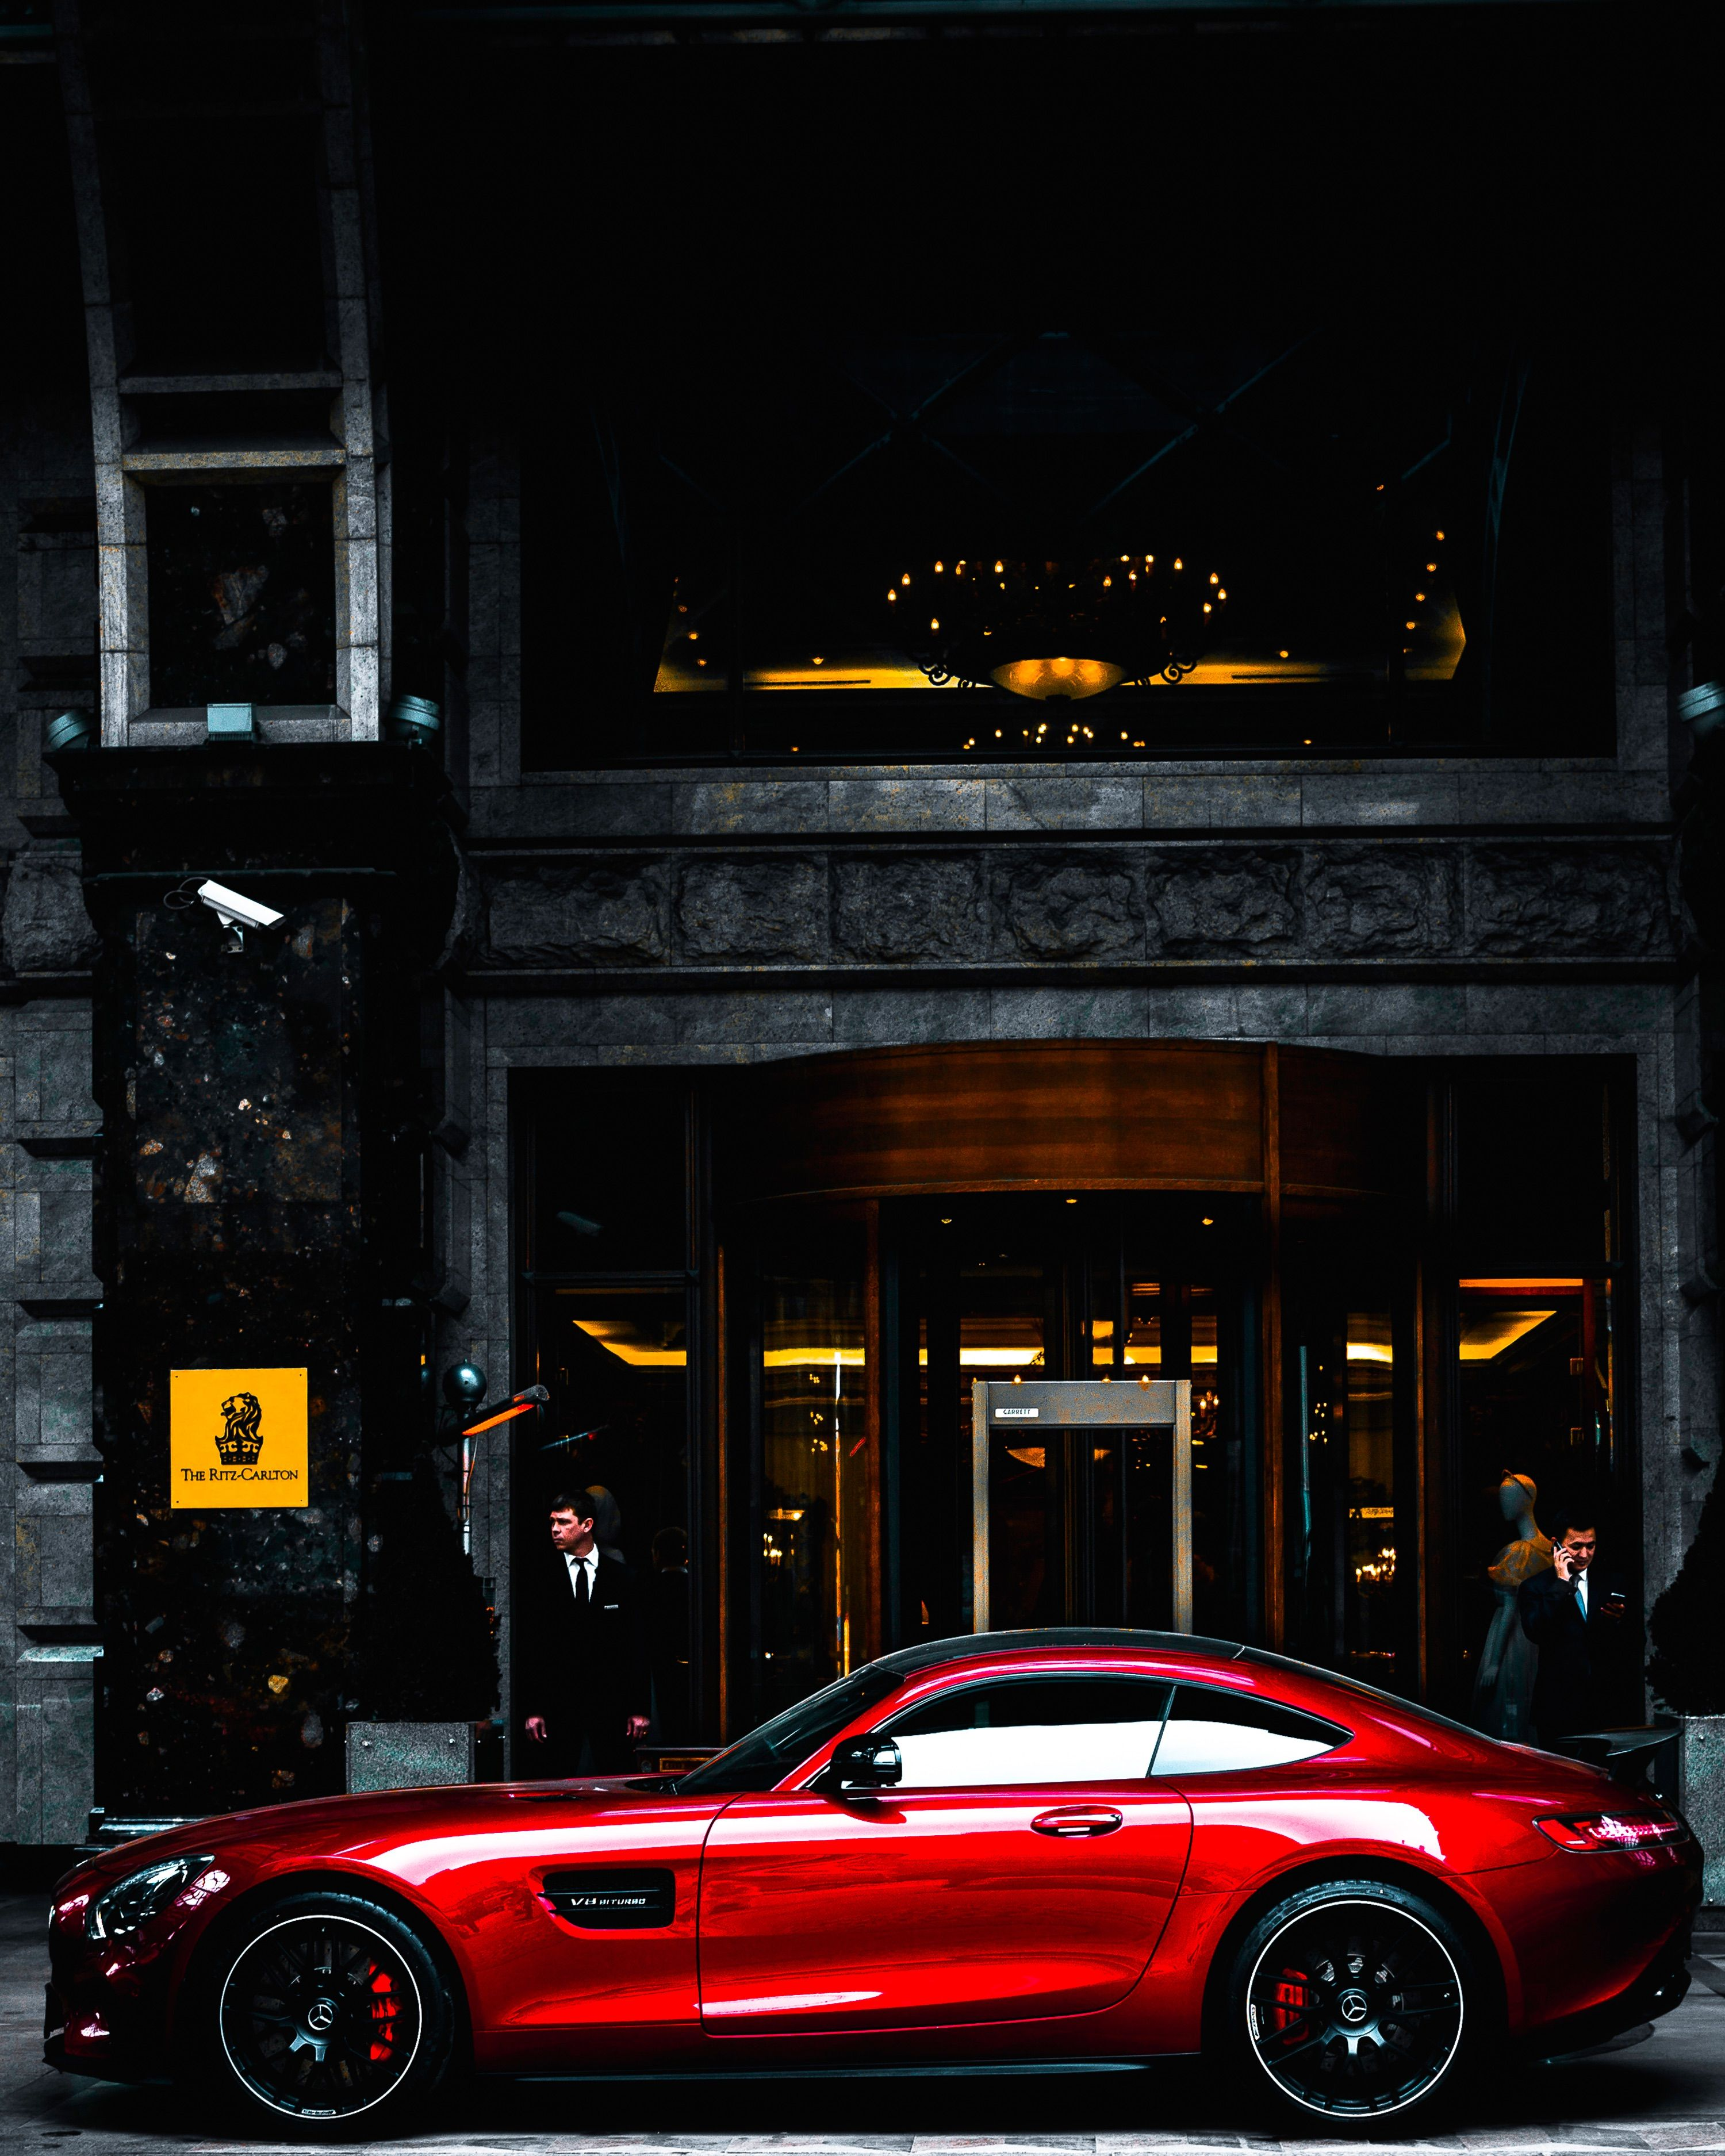 Photo By Serge Kutuzov Unsplash Car Bad Credit Car Loan Car Tent